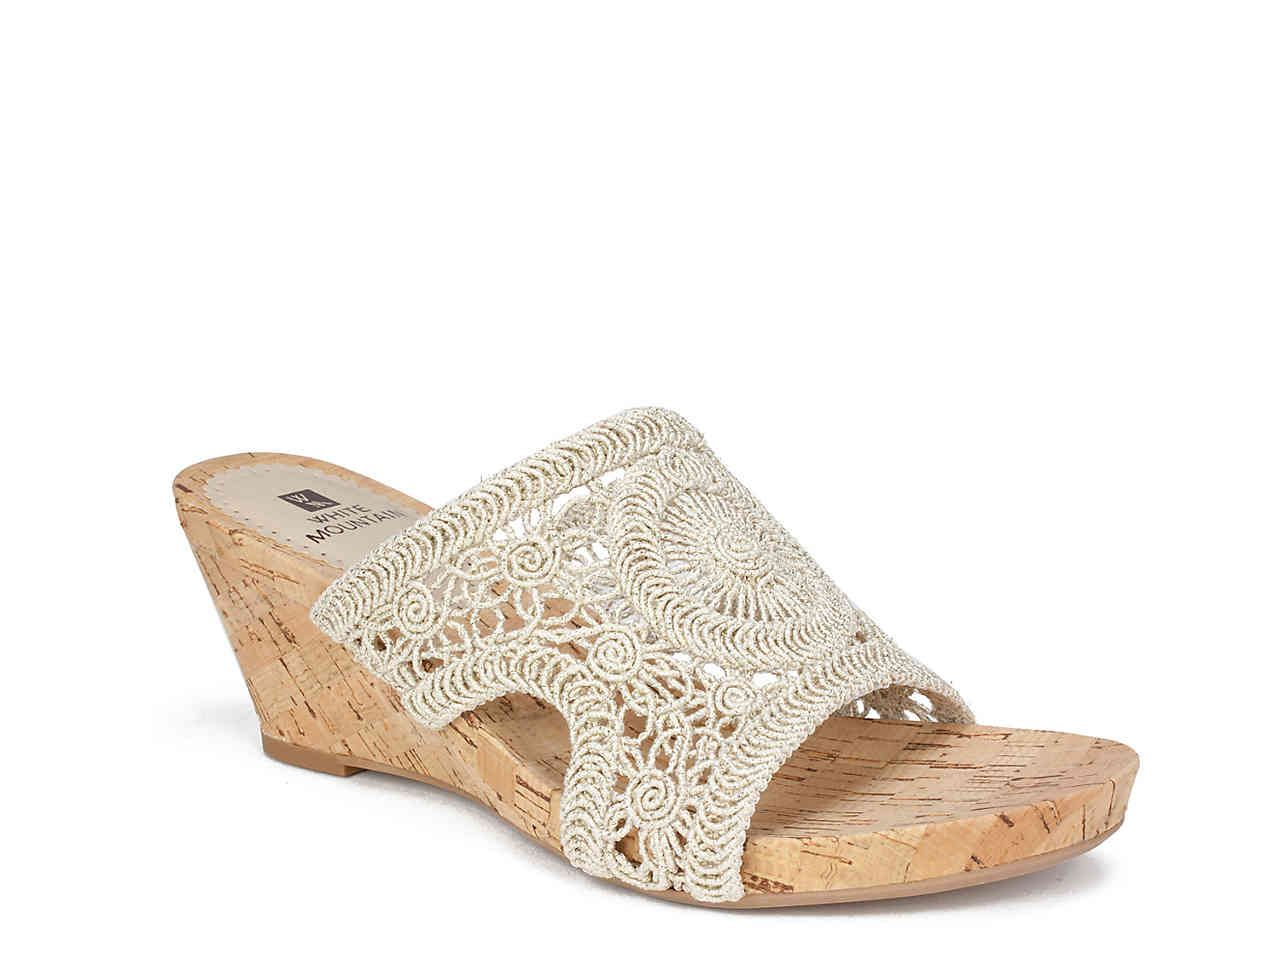 White Mountain Amherst Wedge Sandal